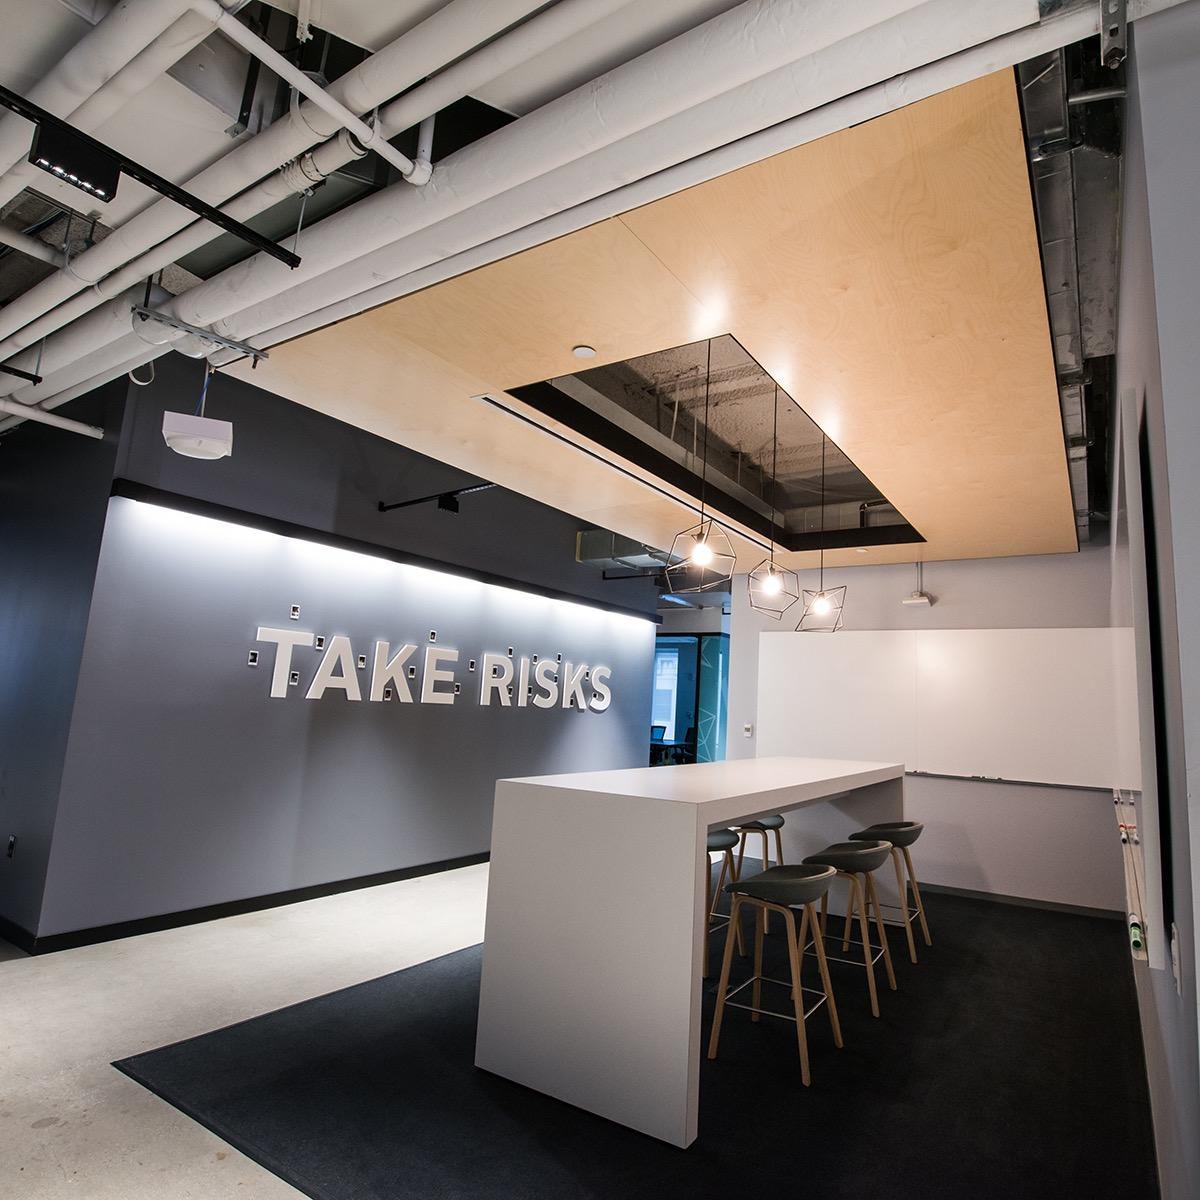 vox-media-nyc-office-12